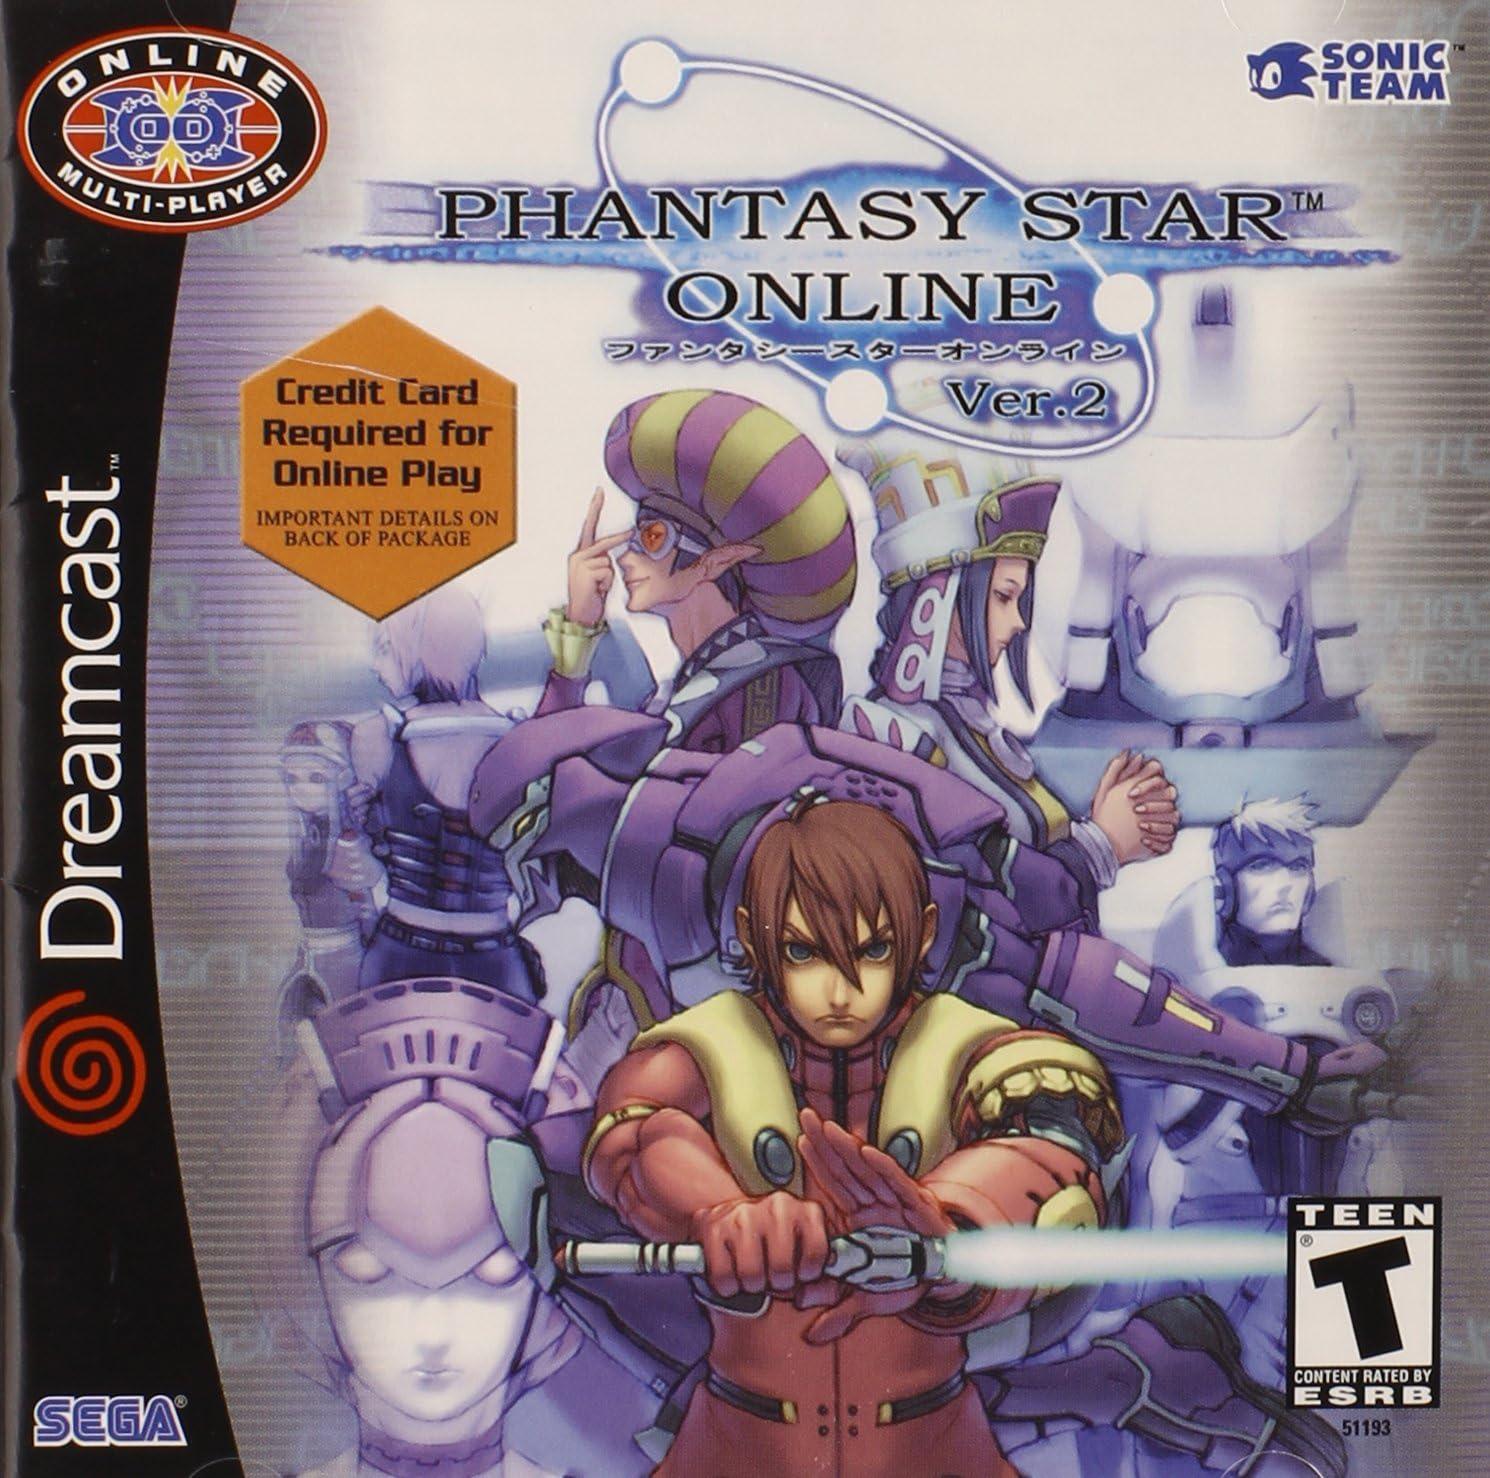 Phantasy Star Online best Dreamcast games.